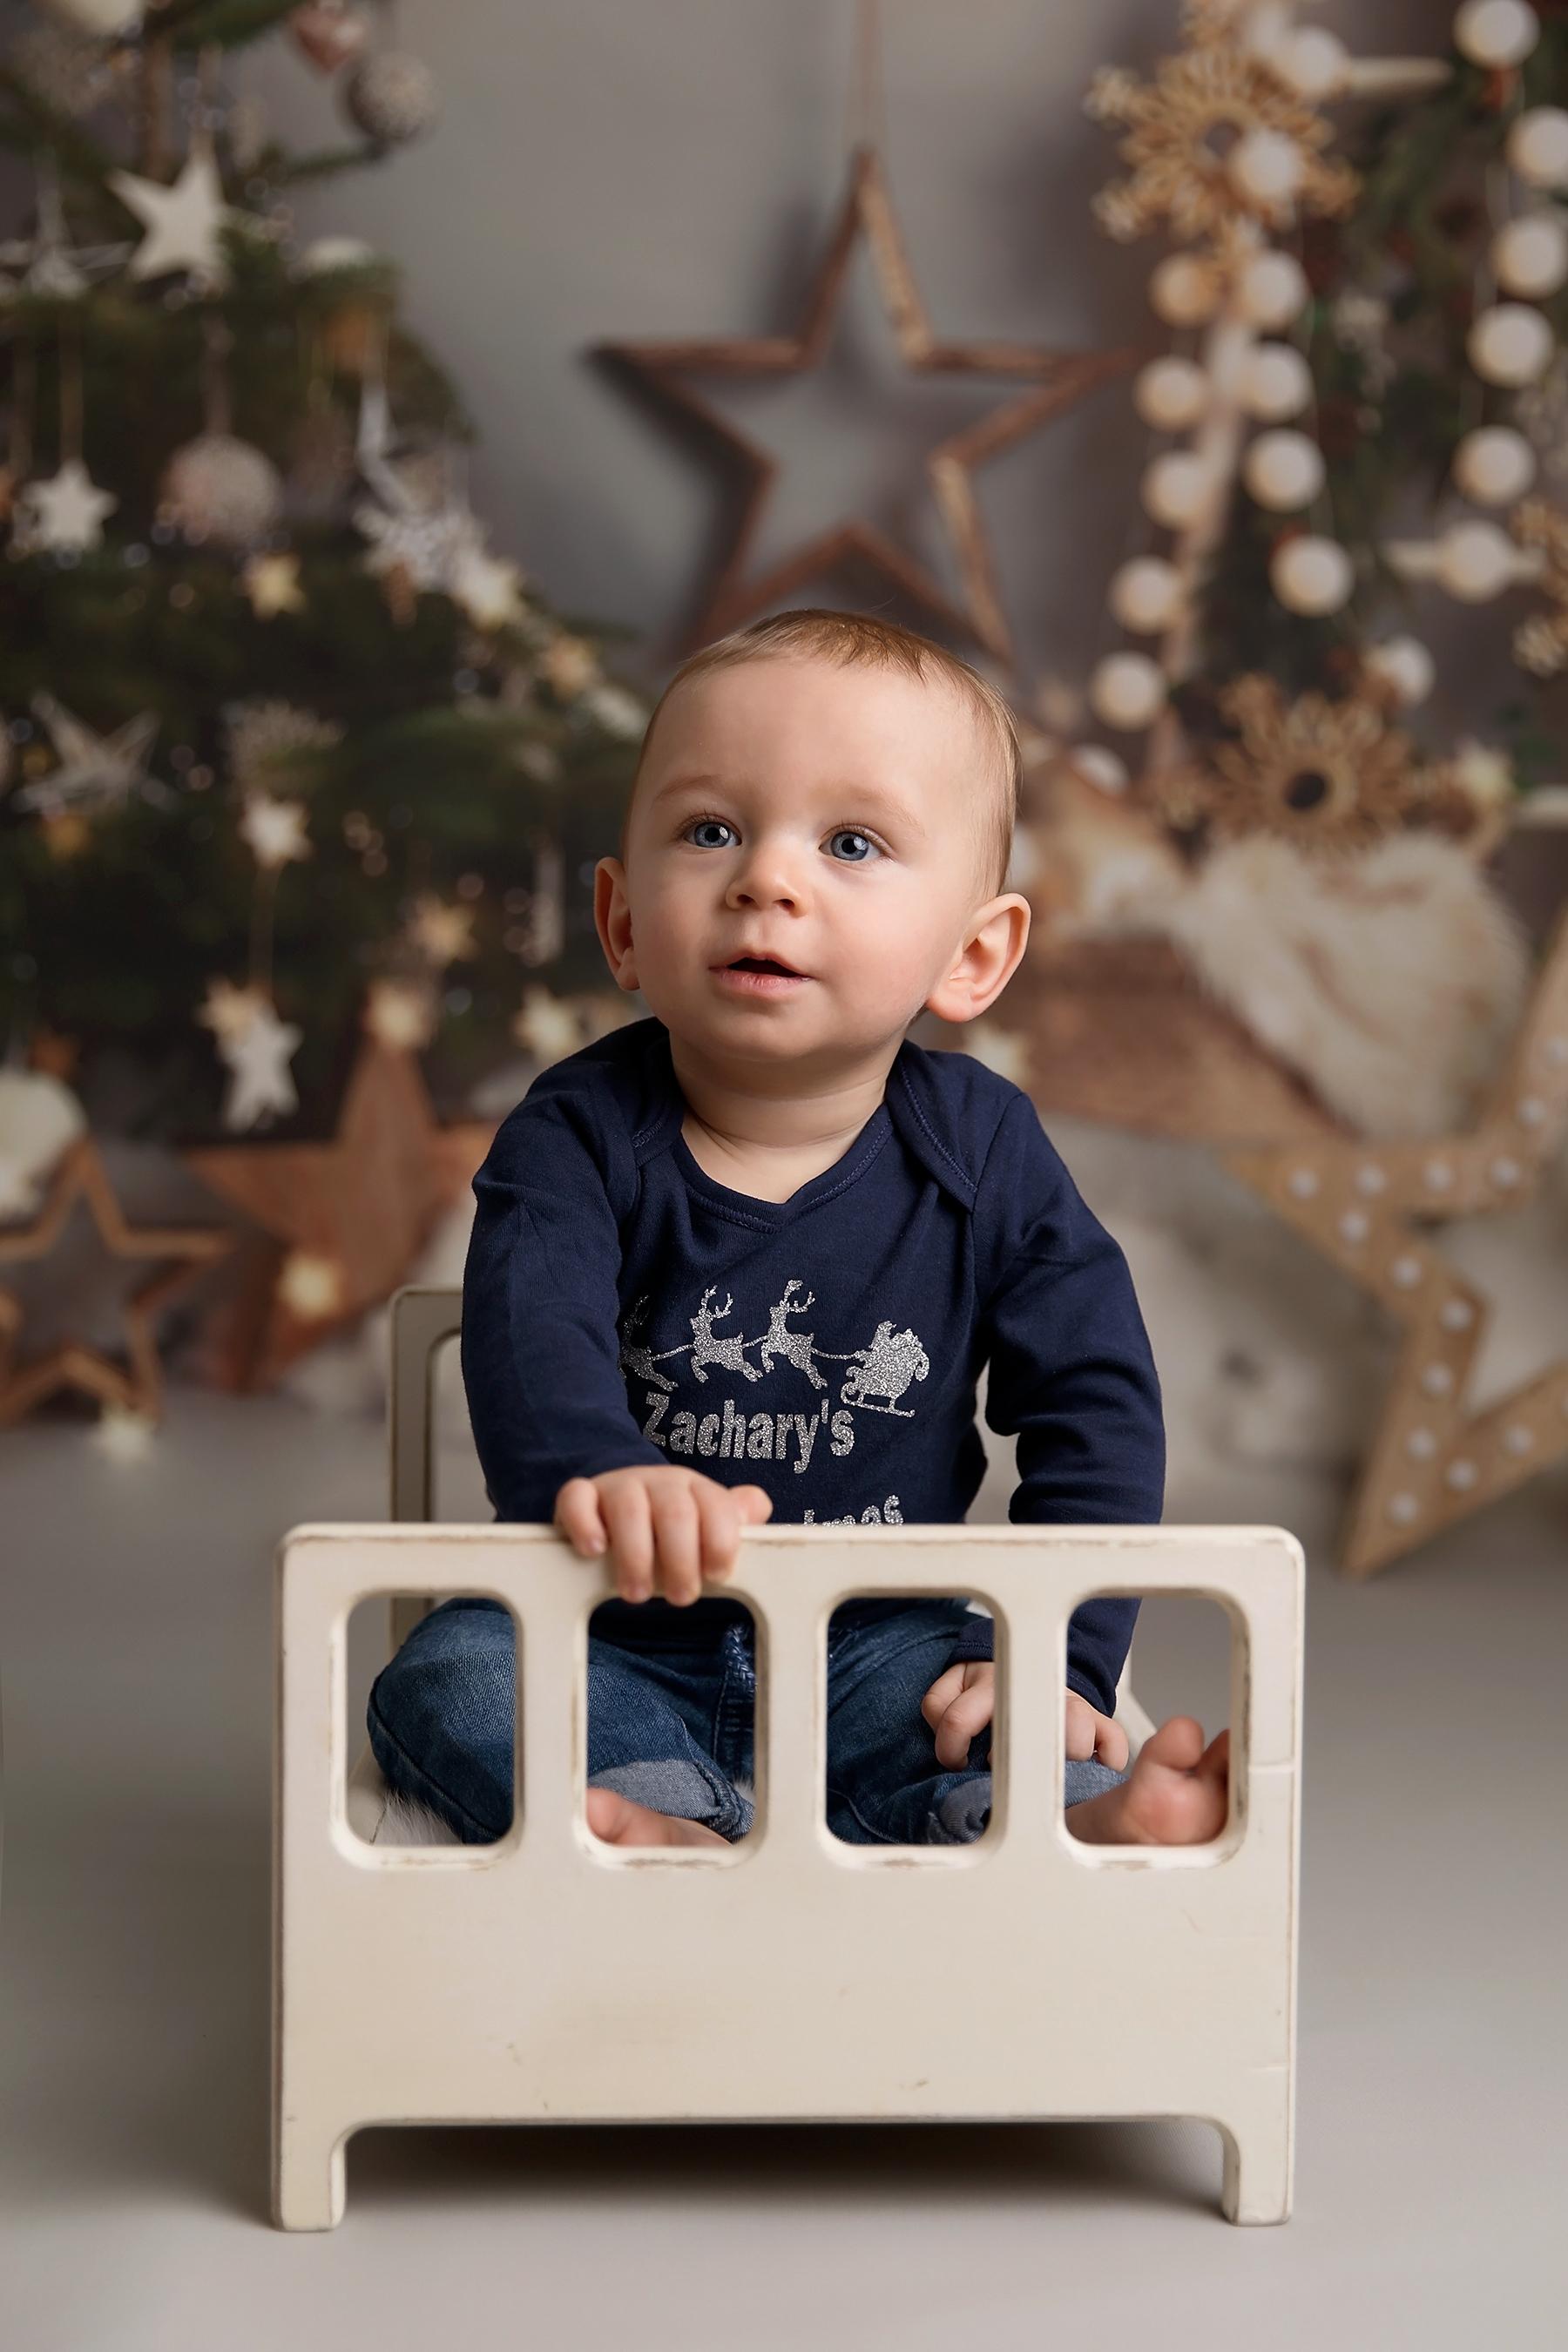 Christmas shots